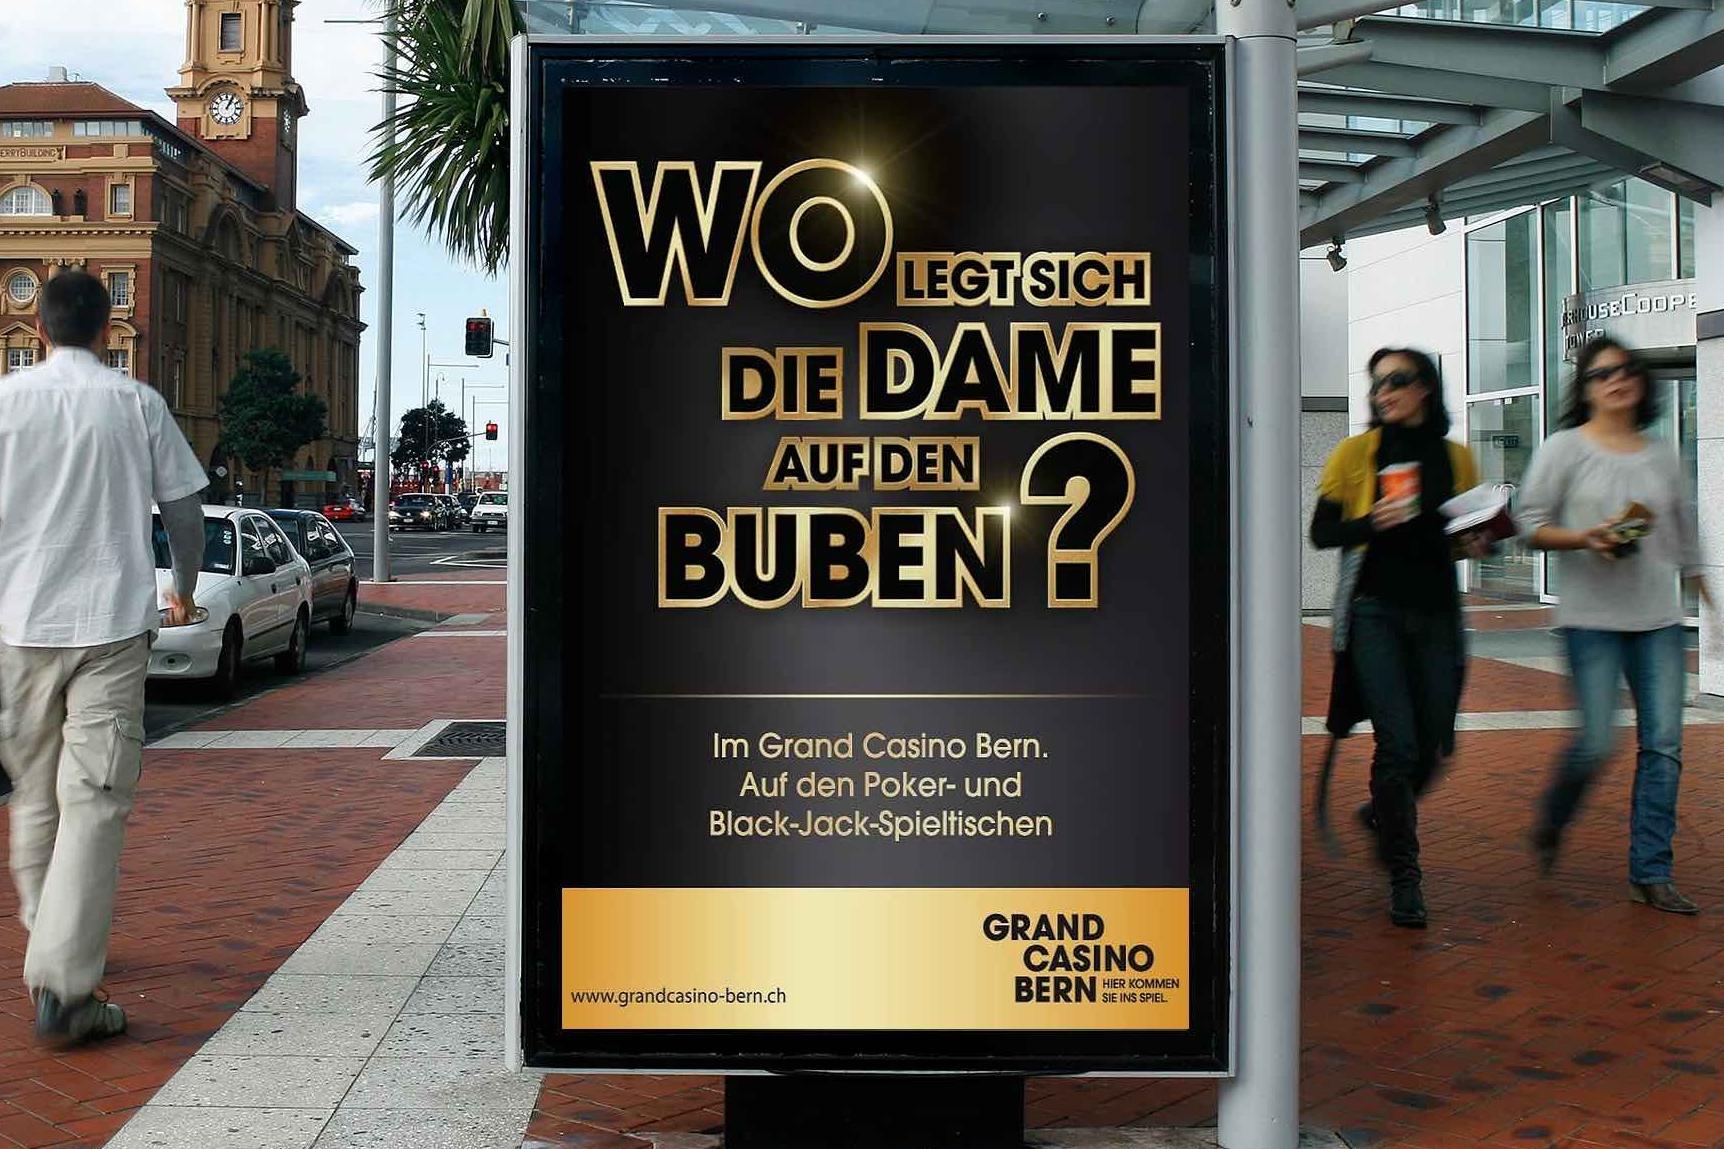 Grand Casino Bern Imagekampagne 2013: Poker und Black Jack